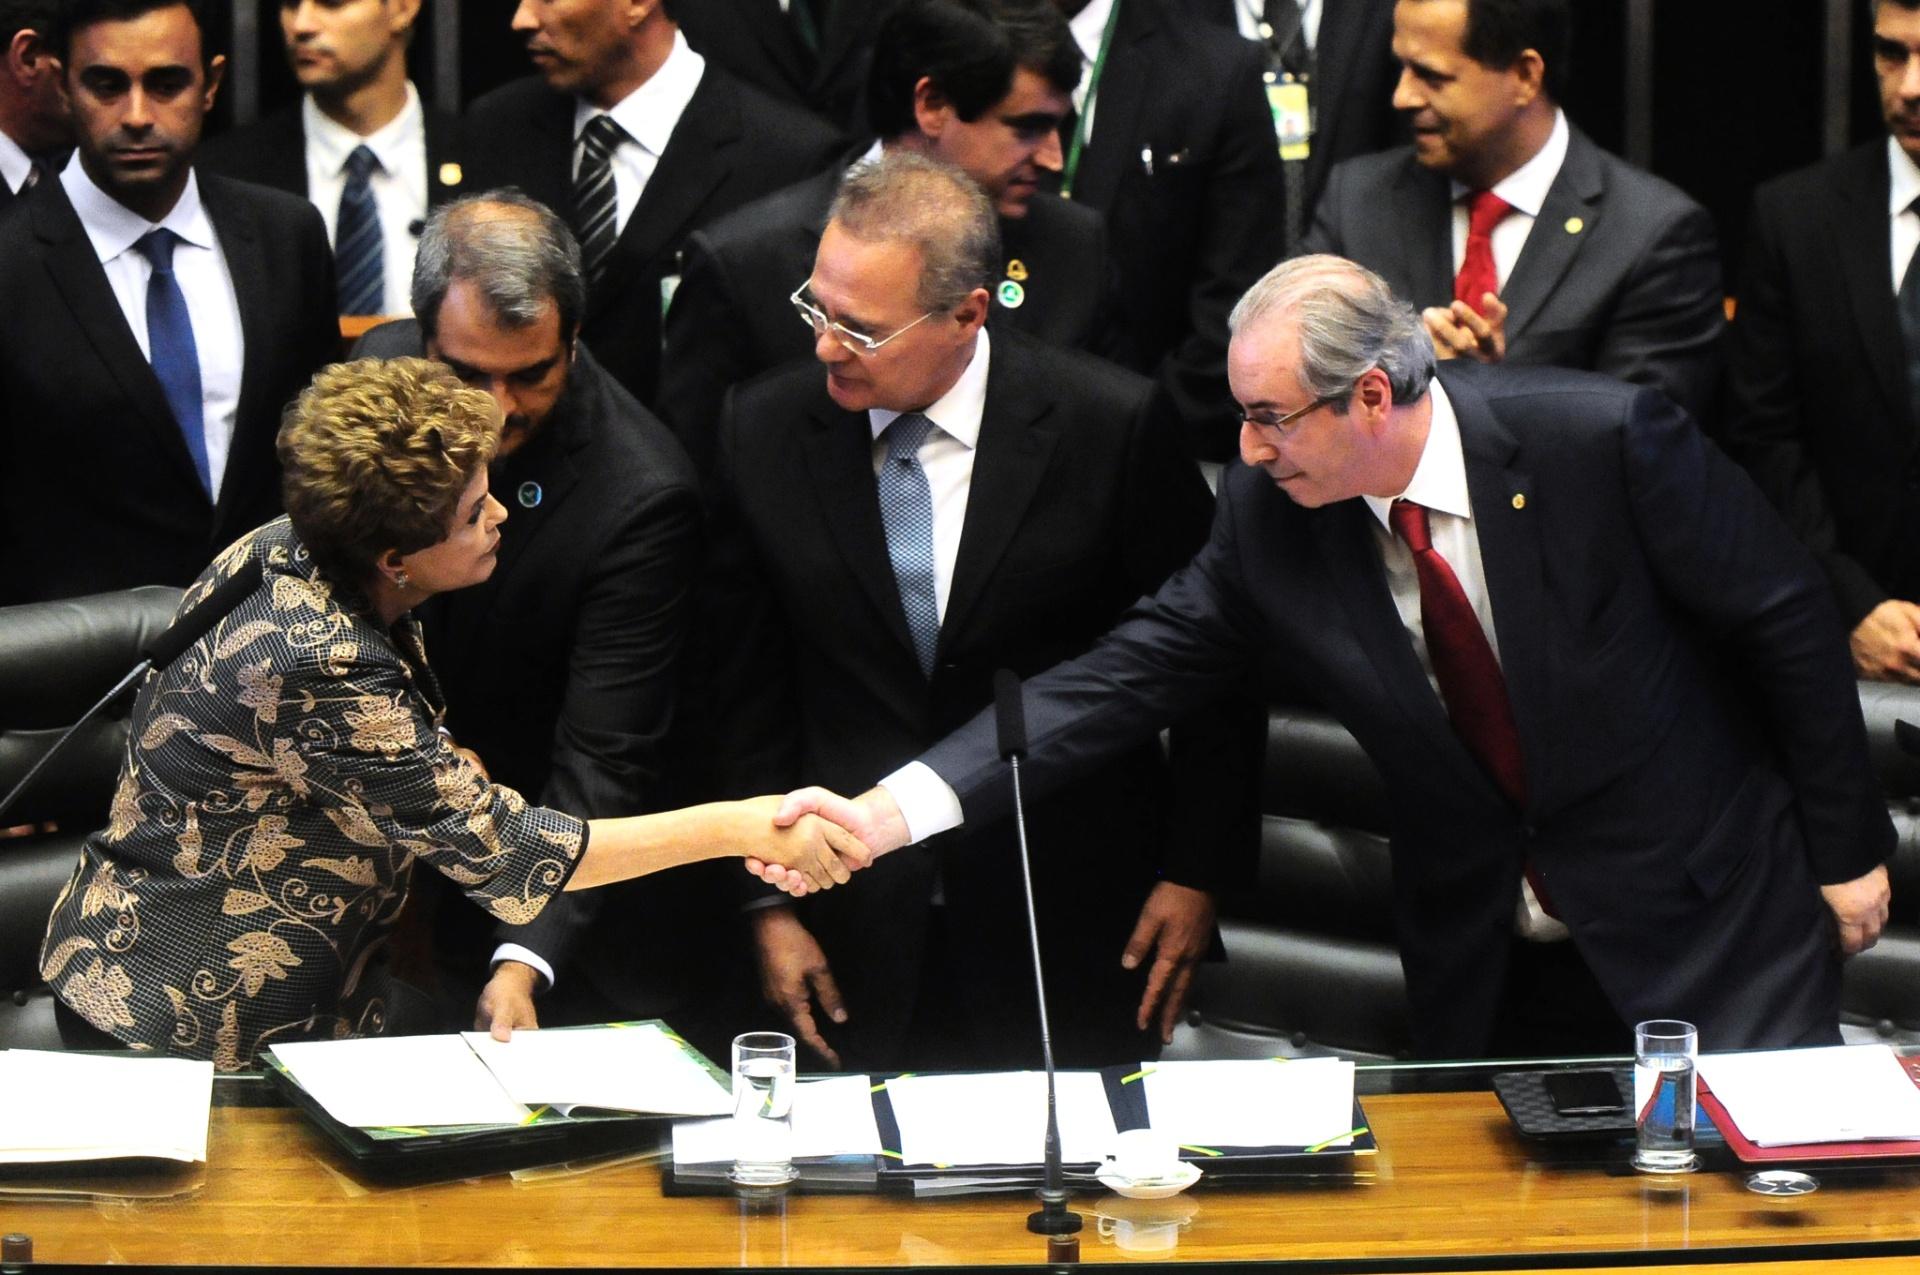 2.fev.2016 - A presidente Dilma Rousseff cumprimenta o presidente da Câmara dos Deputados, Eduardo Cunha, durante abertura do ano legislativo no Congresso Nacional. Entre eles, o presidente do Senado, Renan Calheiros